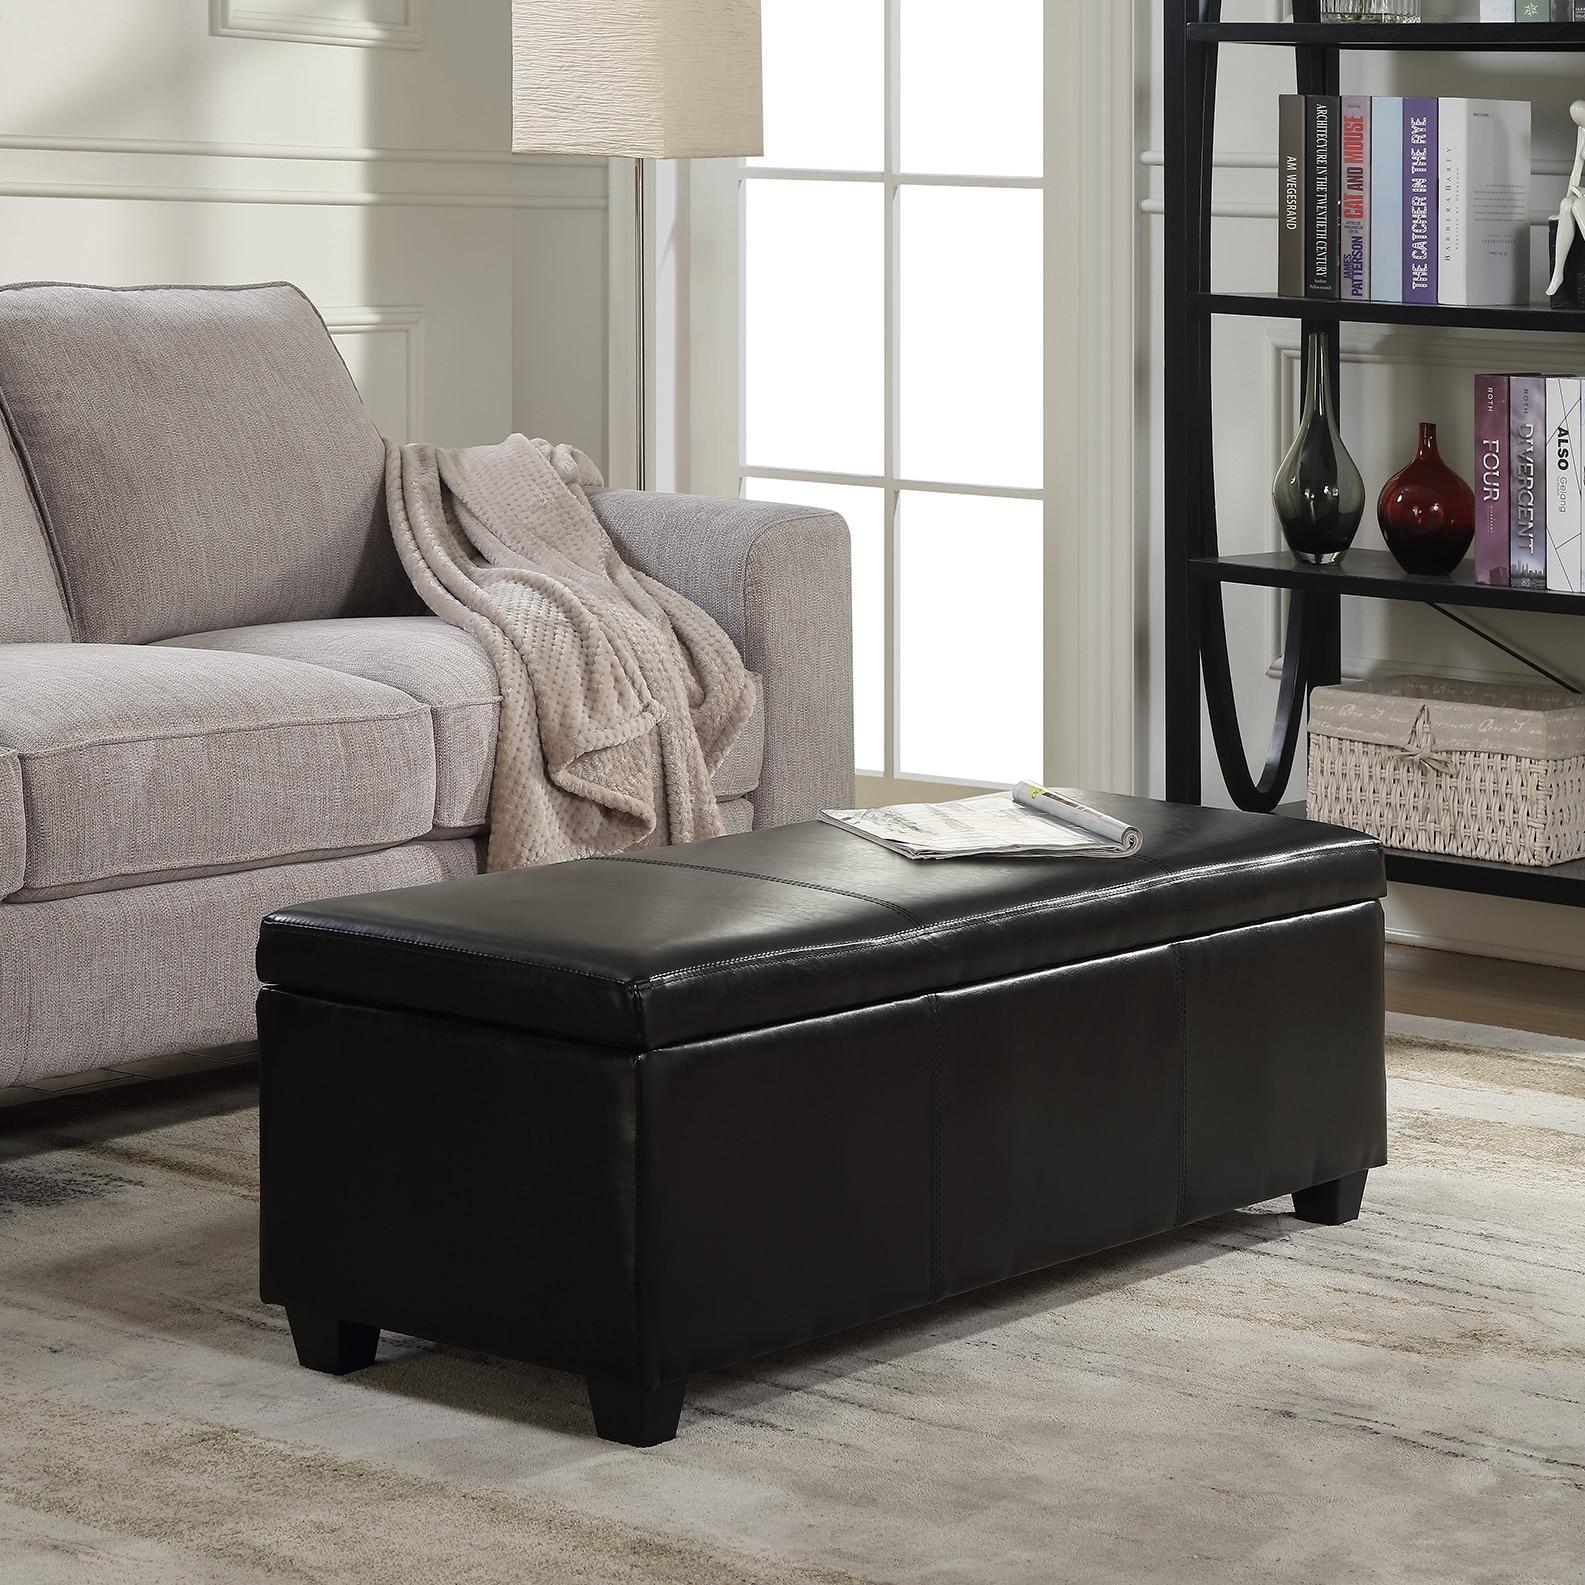 Belleze Modern Elegant Ottoman Storage Bench Faux Leather Linen 48 Standard On Sale Overstock 22163149